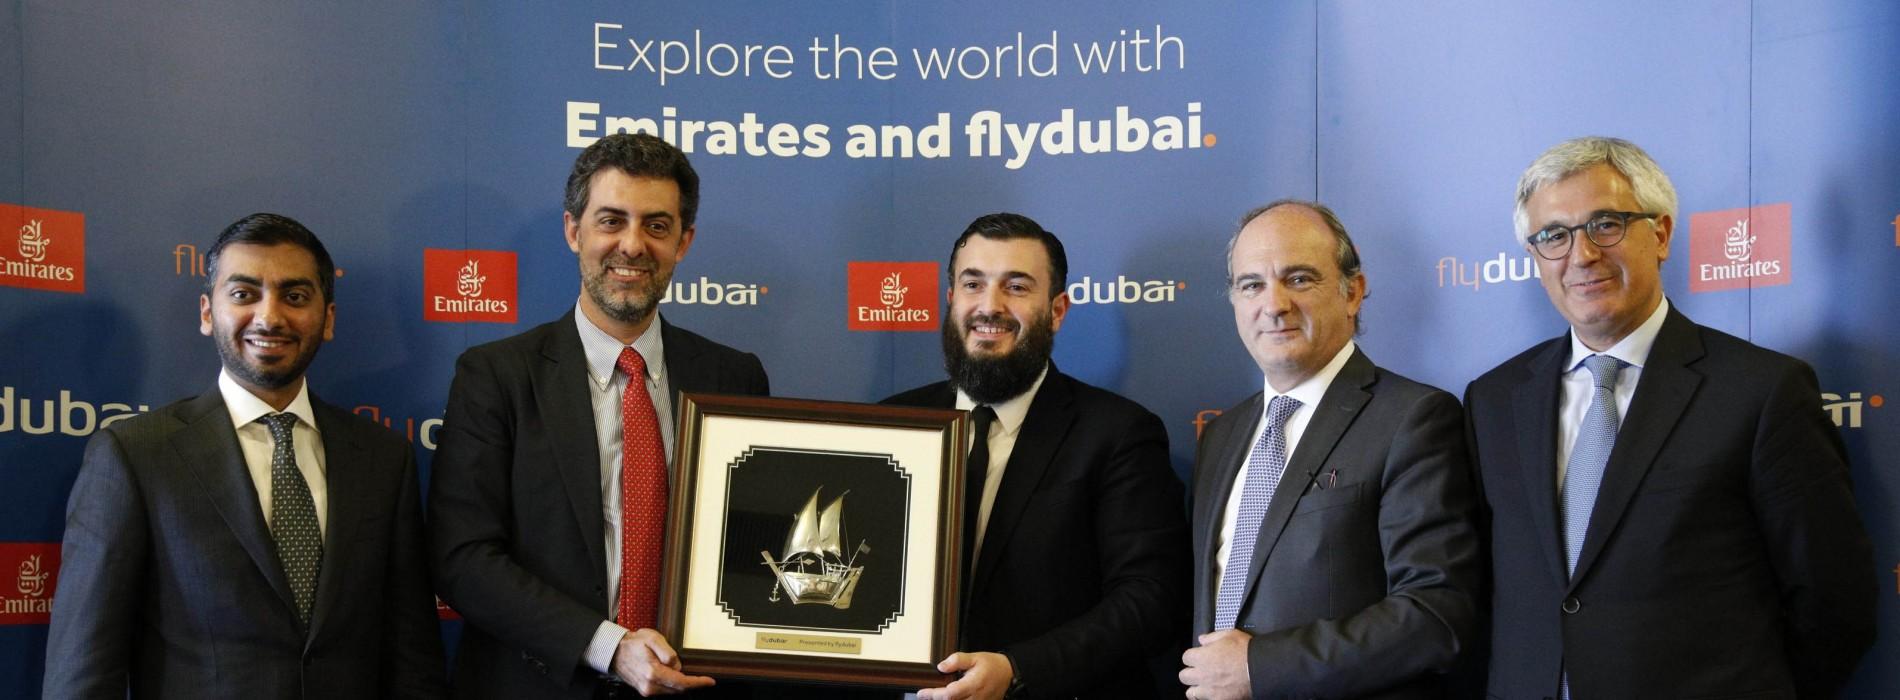 flydubai marks first direct flight between Dubai and Sicily